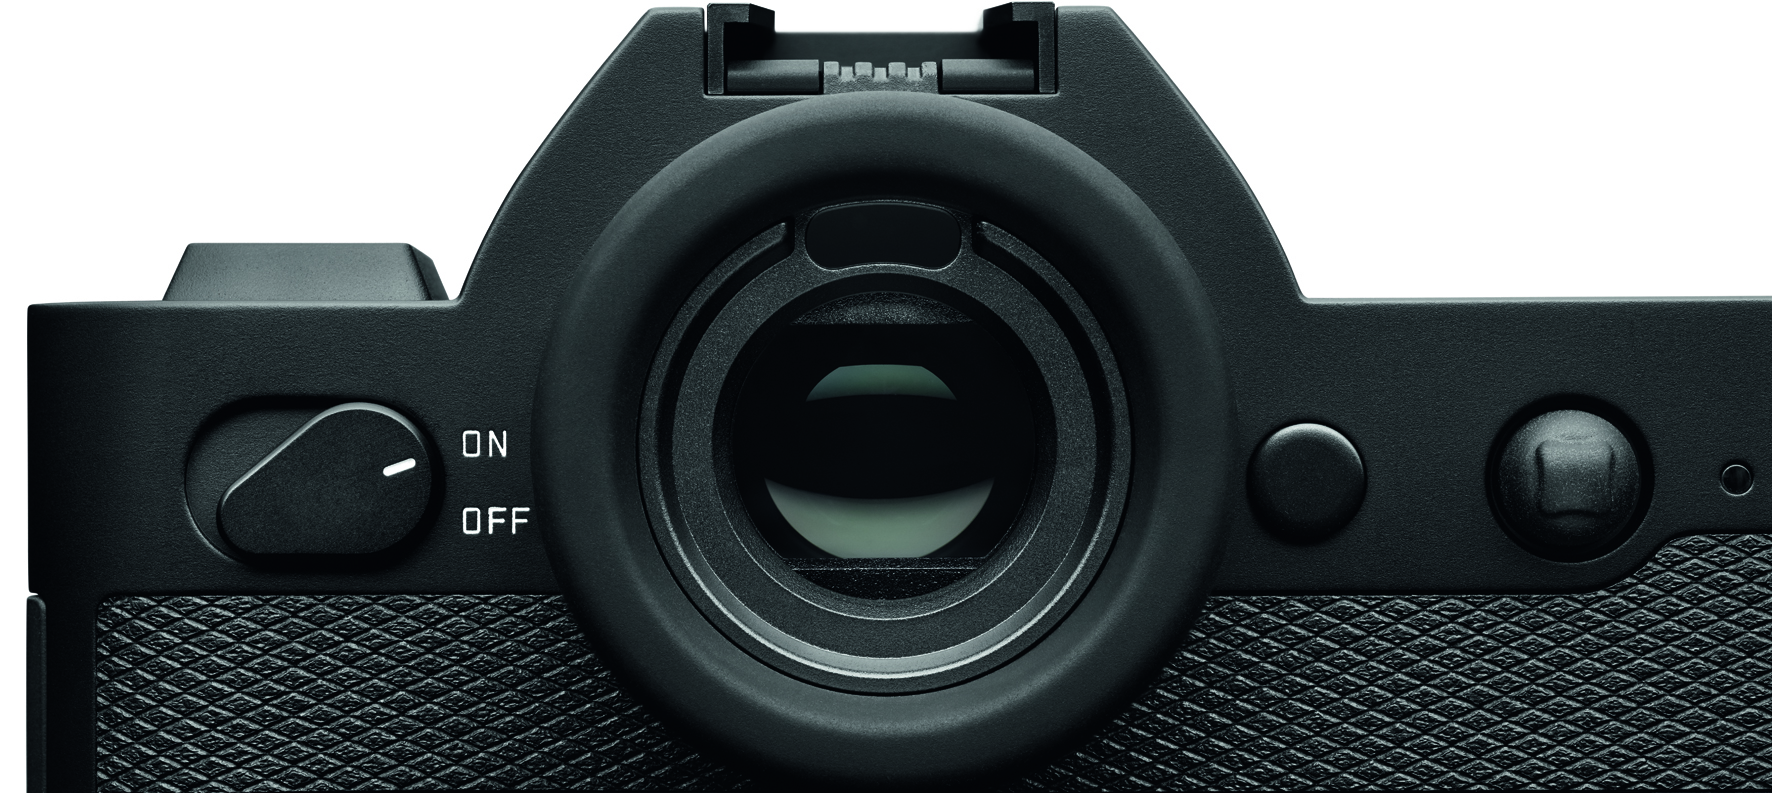 Leica SL_CU_1 (2)